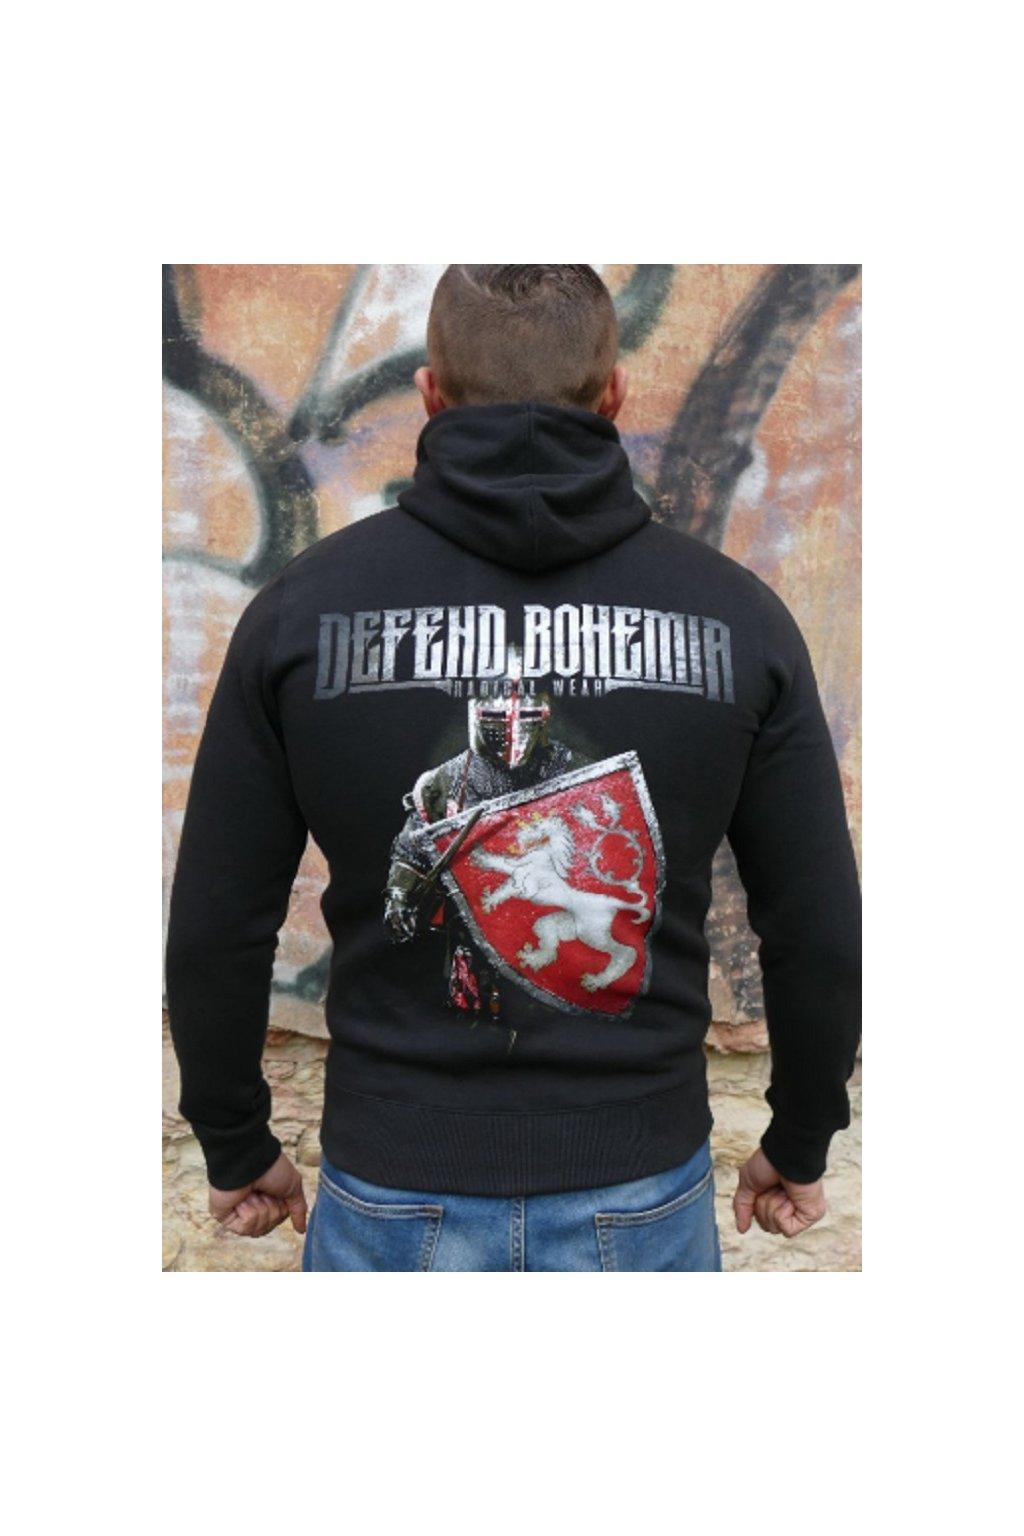 Radical Wear pánská mikina Defend Bohemia obr1